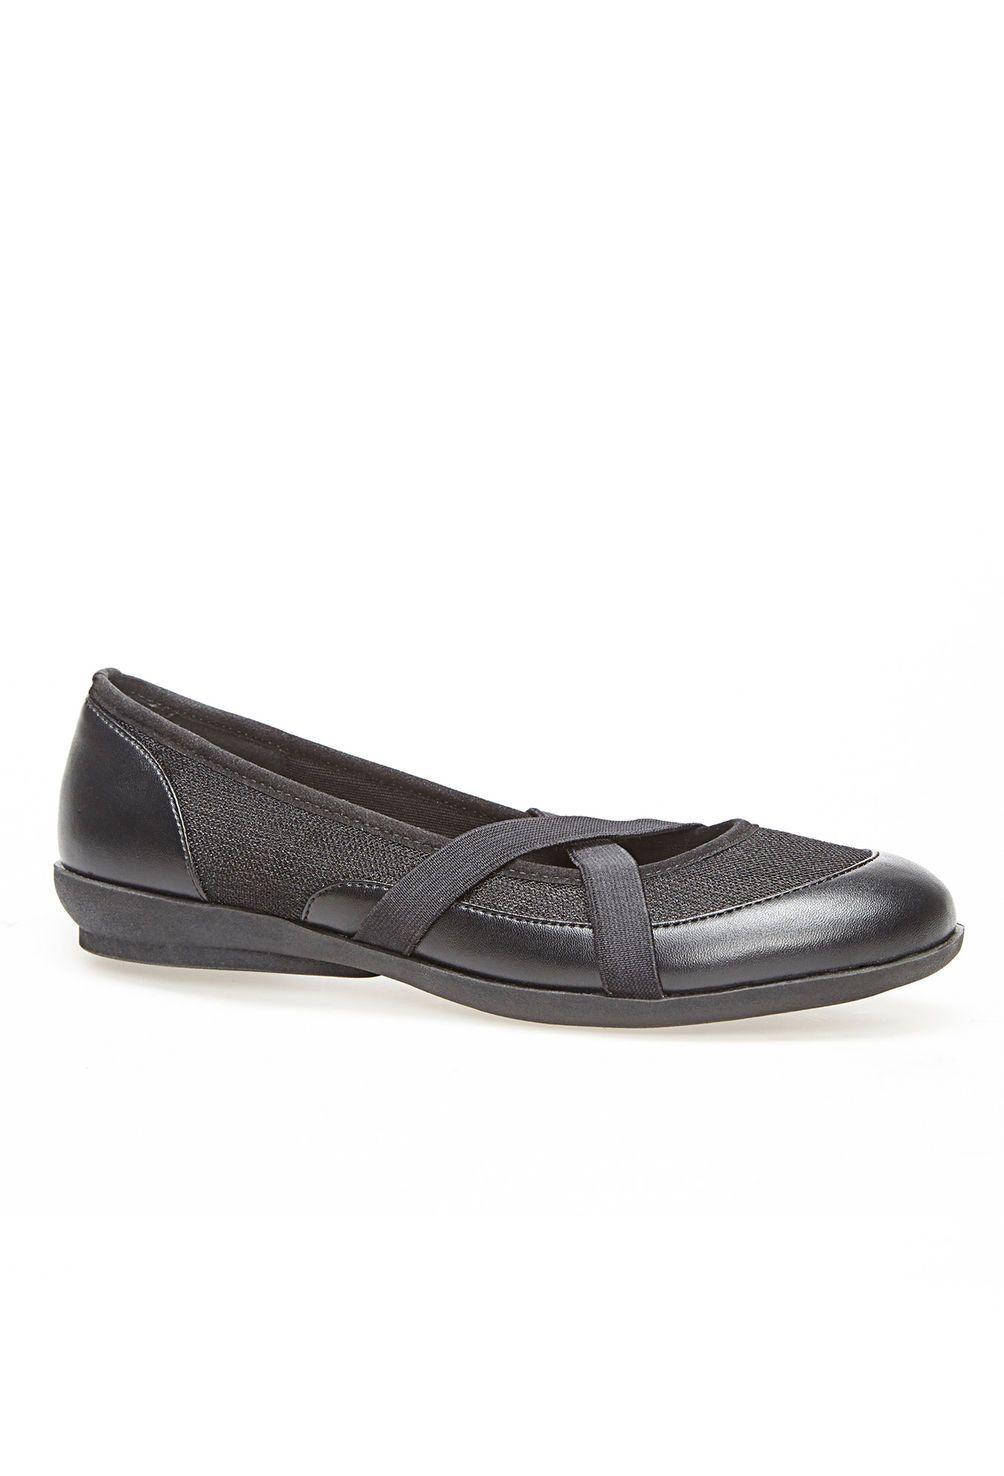 1ecb682a10c Olympia Criss Cross Cloudwalkers® Comfort Shoe-Wide Width Shoe-Avenue